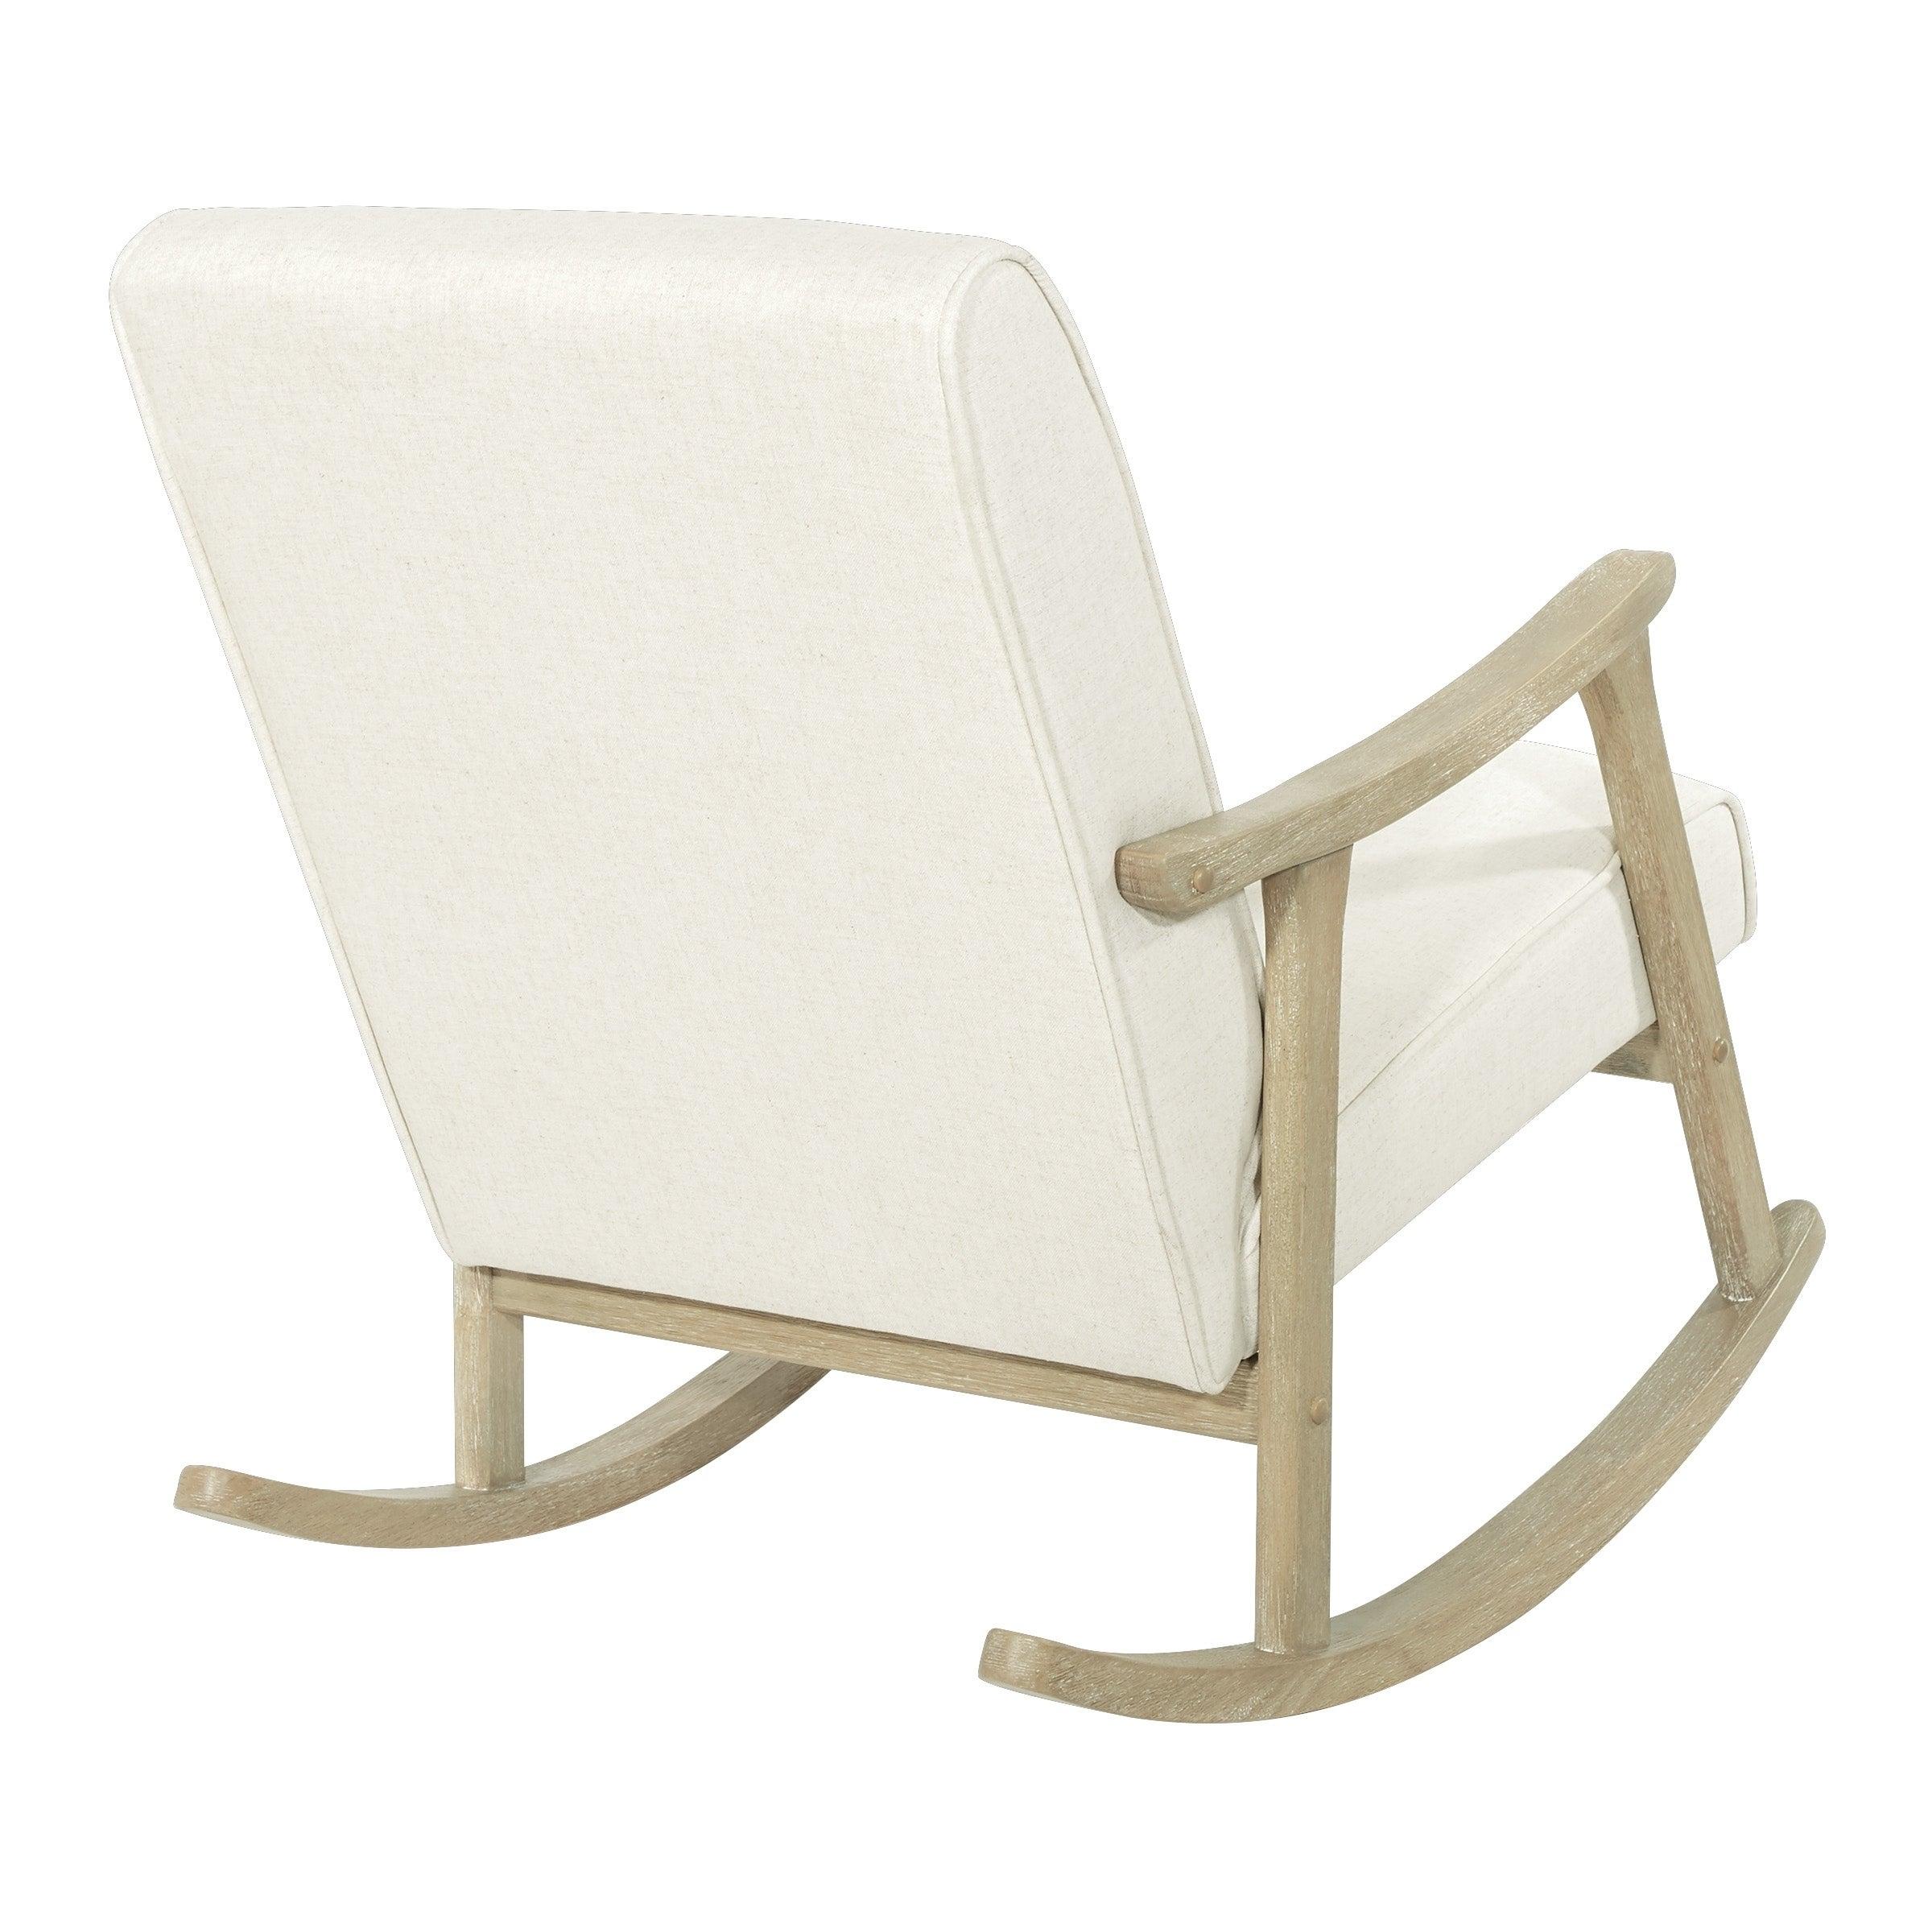 Osp Home Furnishings Gainsborough Rocker In Linen Fabric With Brushed  Finish Base Regarding Rocking Chairs In Linen Fabric With Brushed Finish Base (#12 of 20)